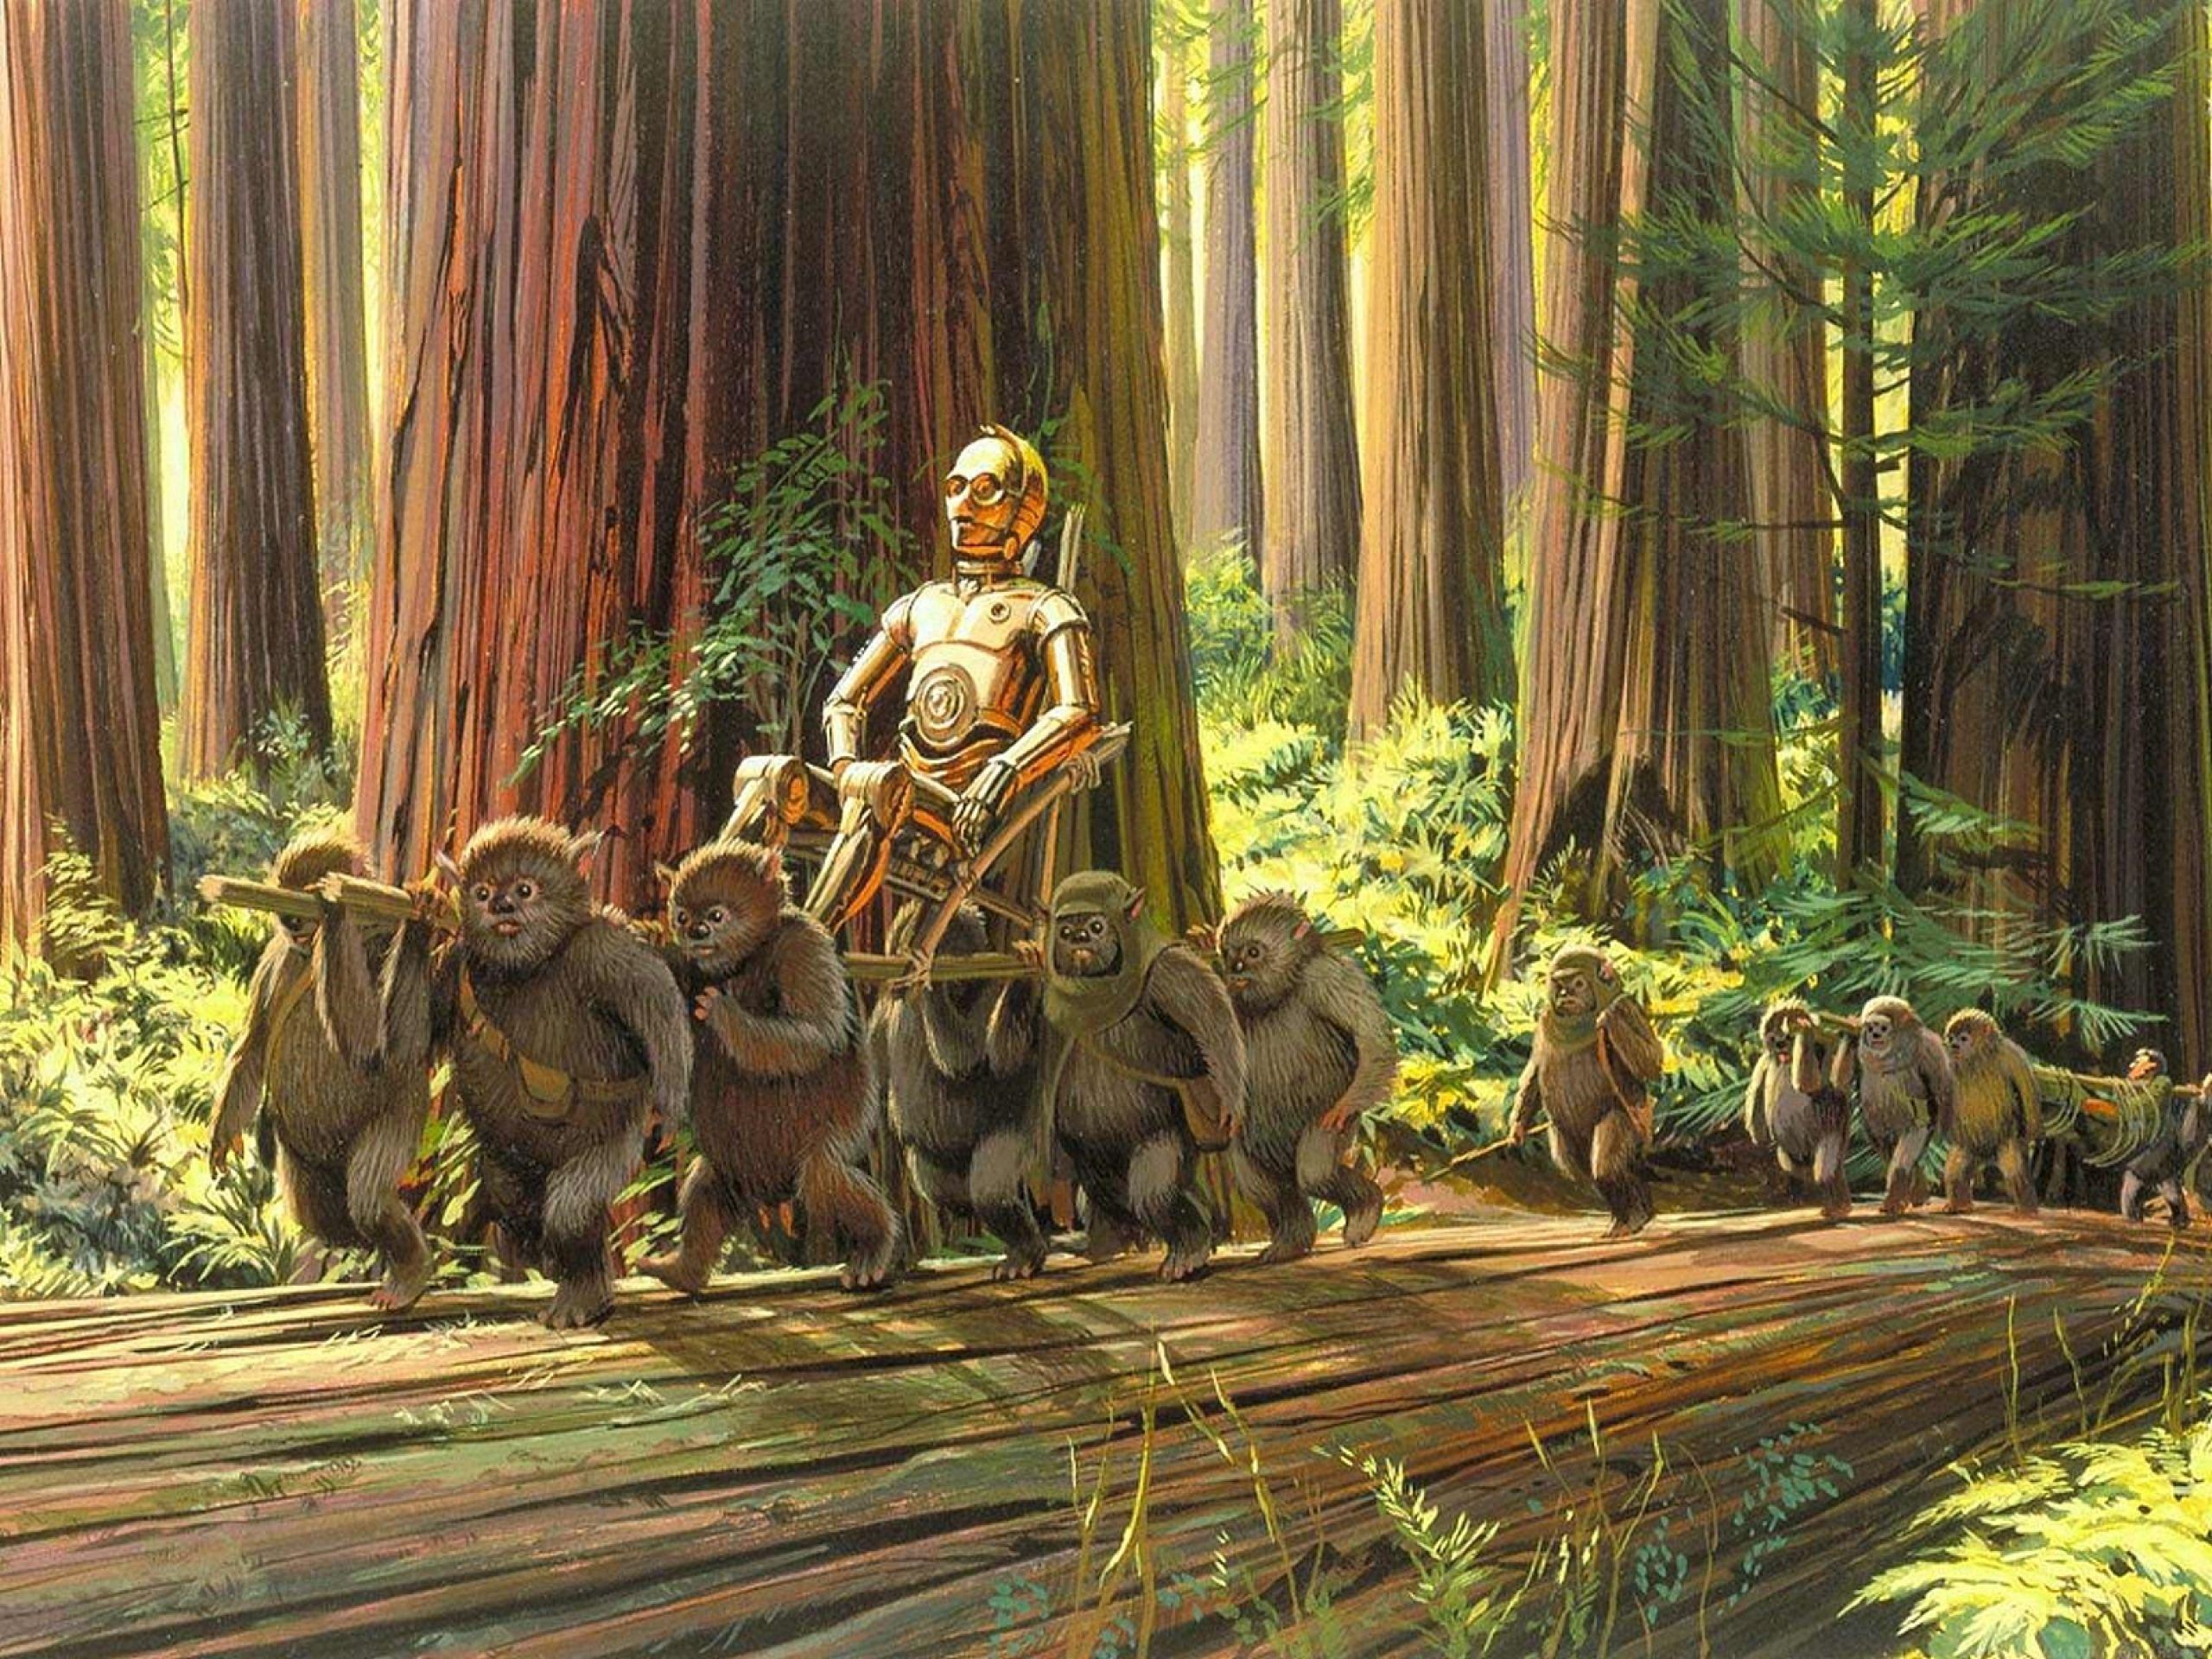 Star Wars C3po Artwork Ralph Mcquarrie Ewoks Wallpaper Hd Star Wars Concept Art Star Wars Artwork Star Wars Art